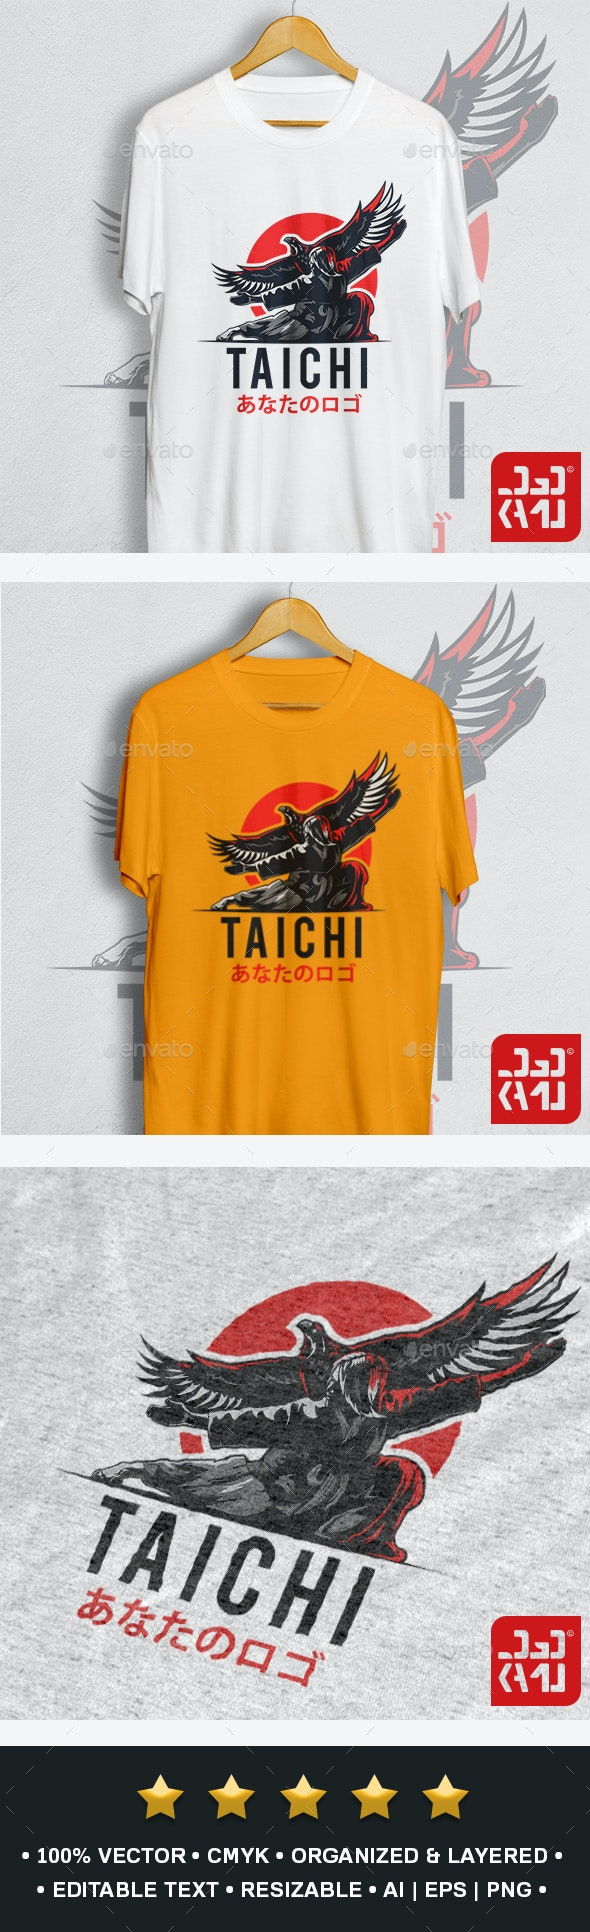 Taichi T-Shirt - Sports & Teams T-Shirts